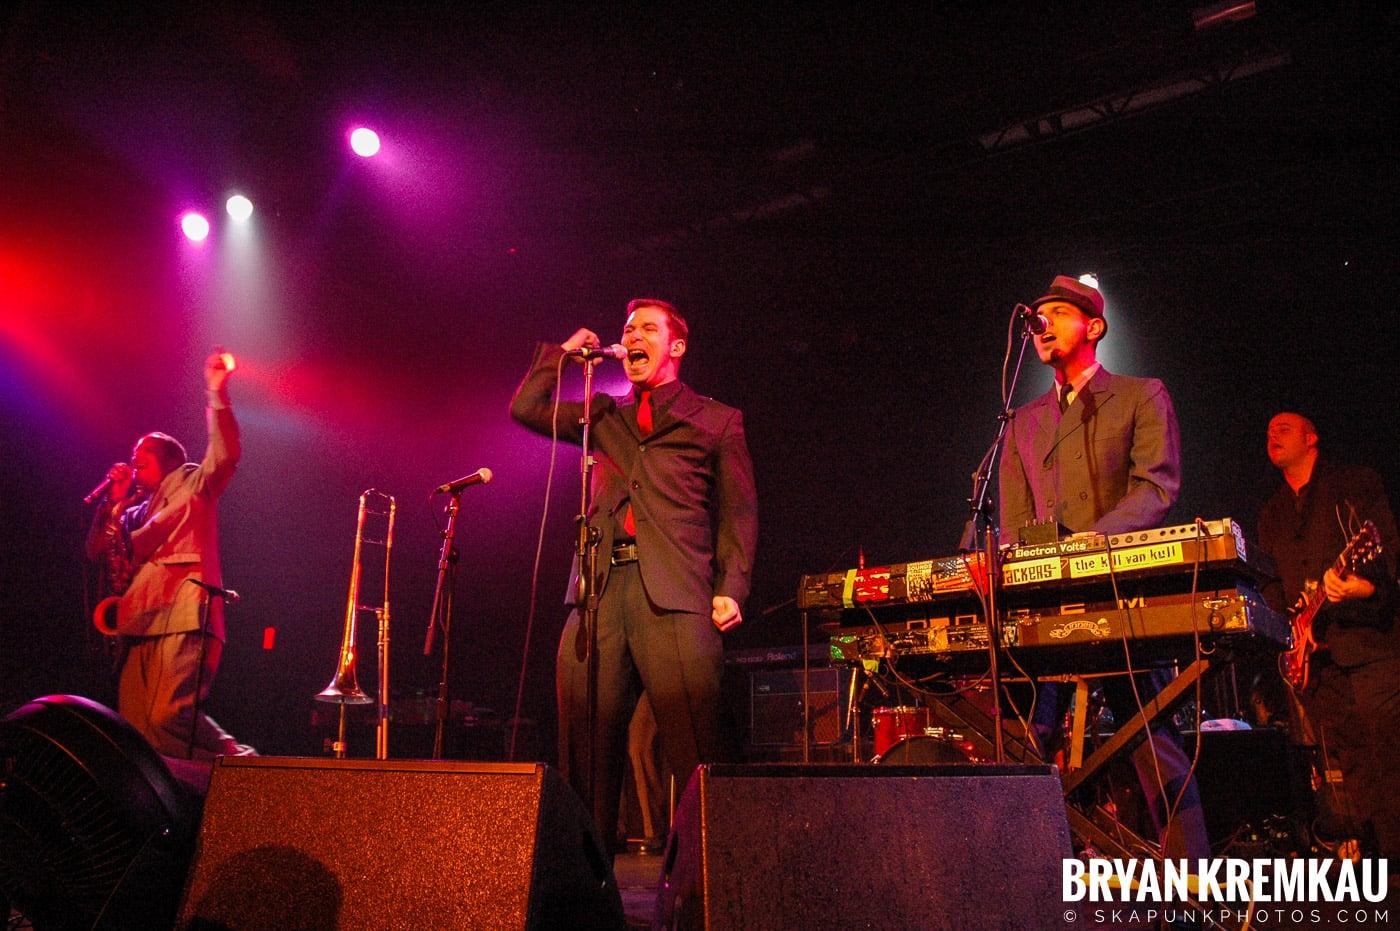 The Slackers @ Nokia Theatre, NYC - 3.17.06 (3)